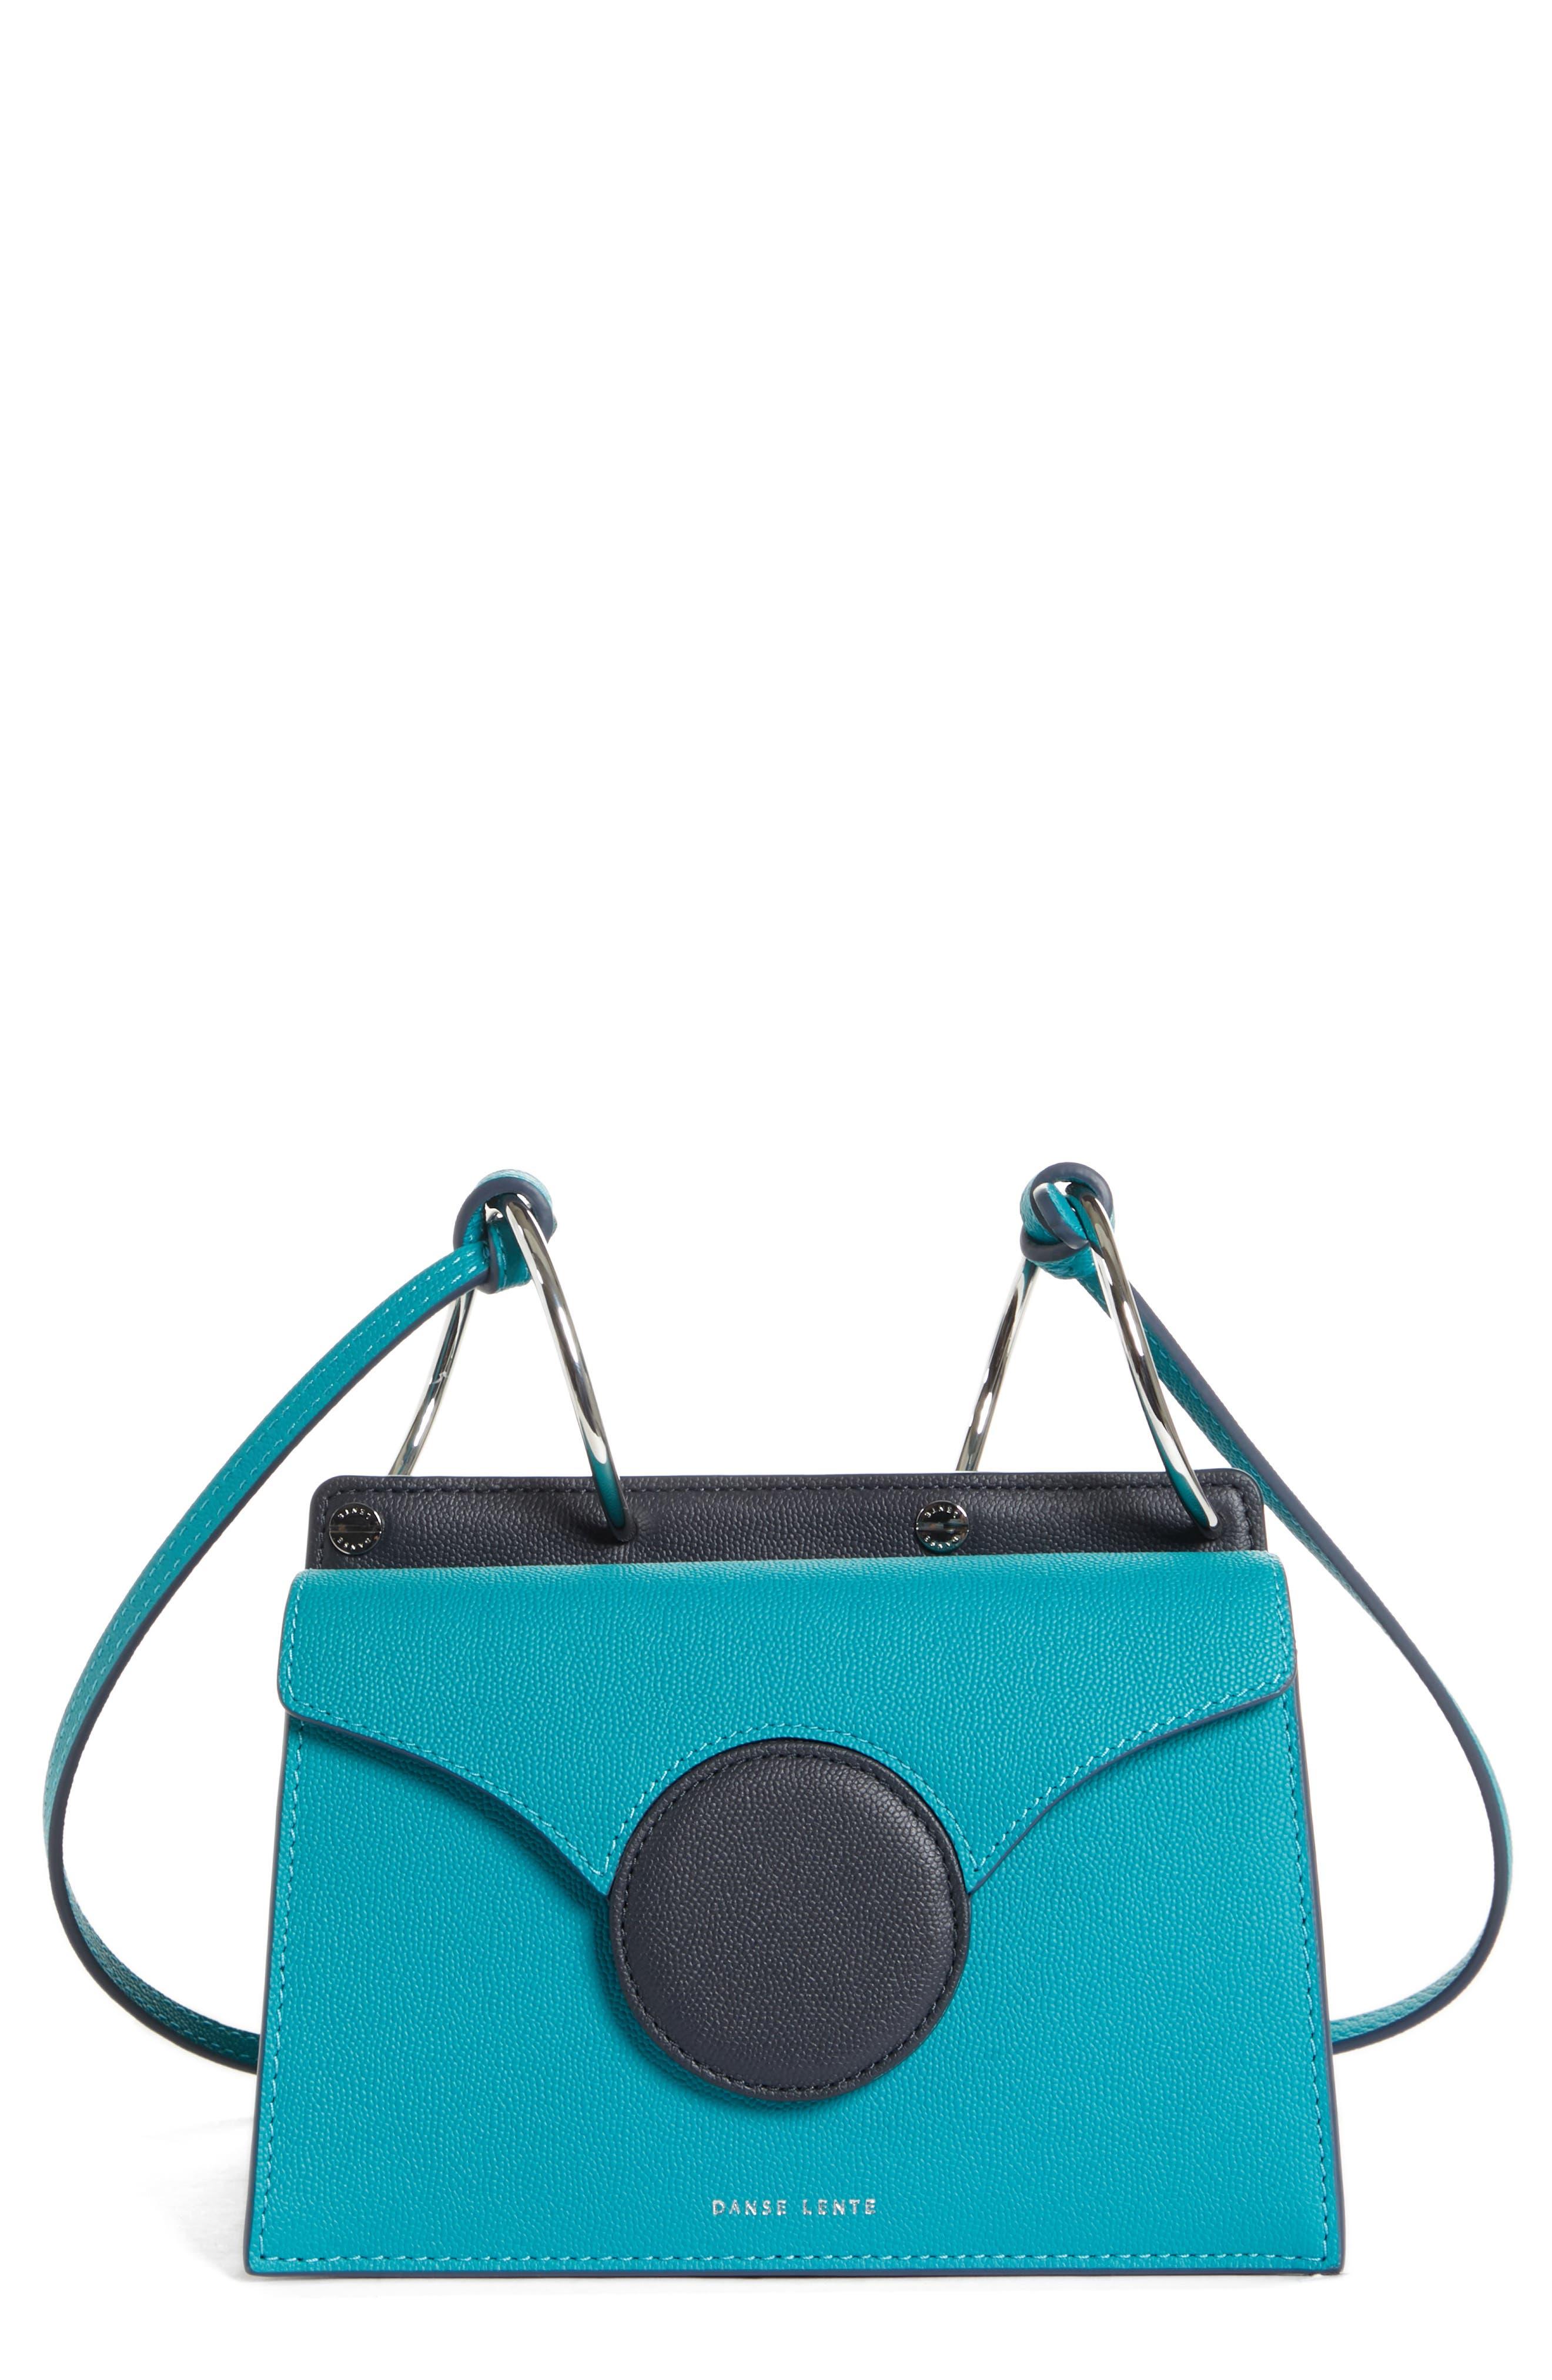 Mini Phoebe Leather Bag,                             Main thumbnail 1, color,                             TURQUOISE